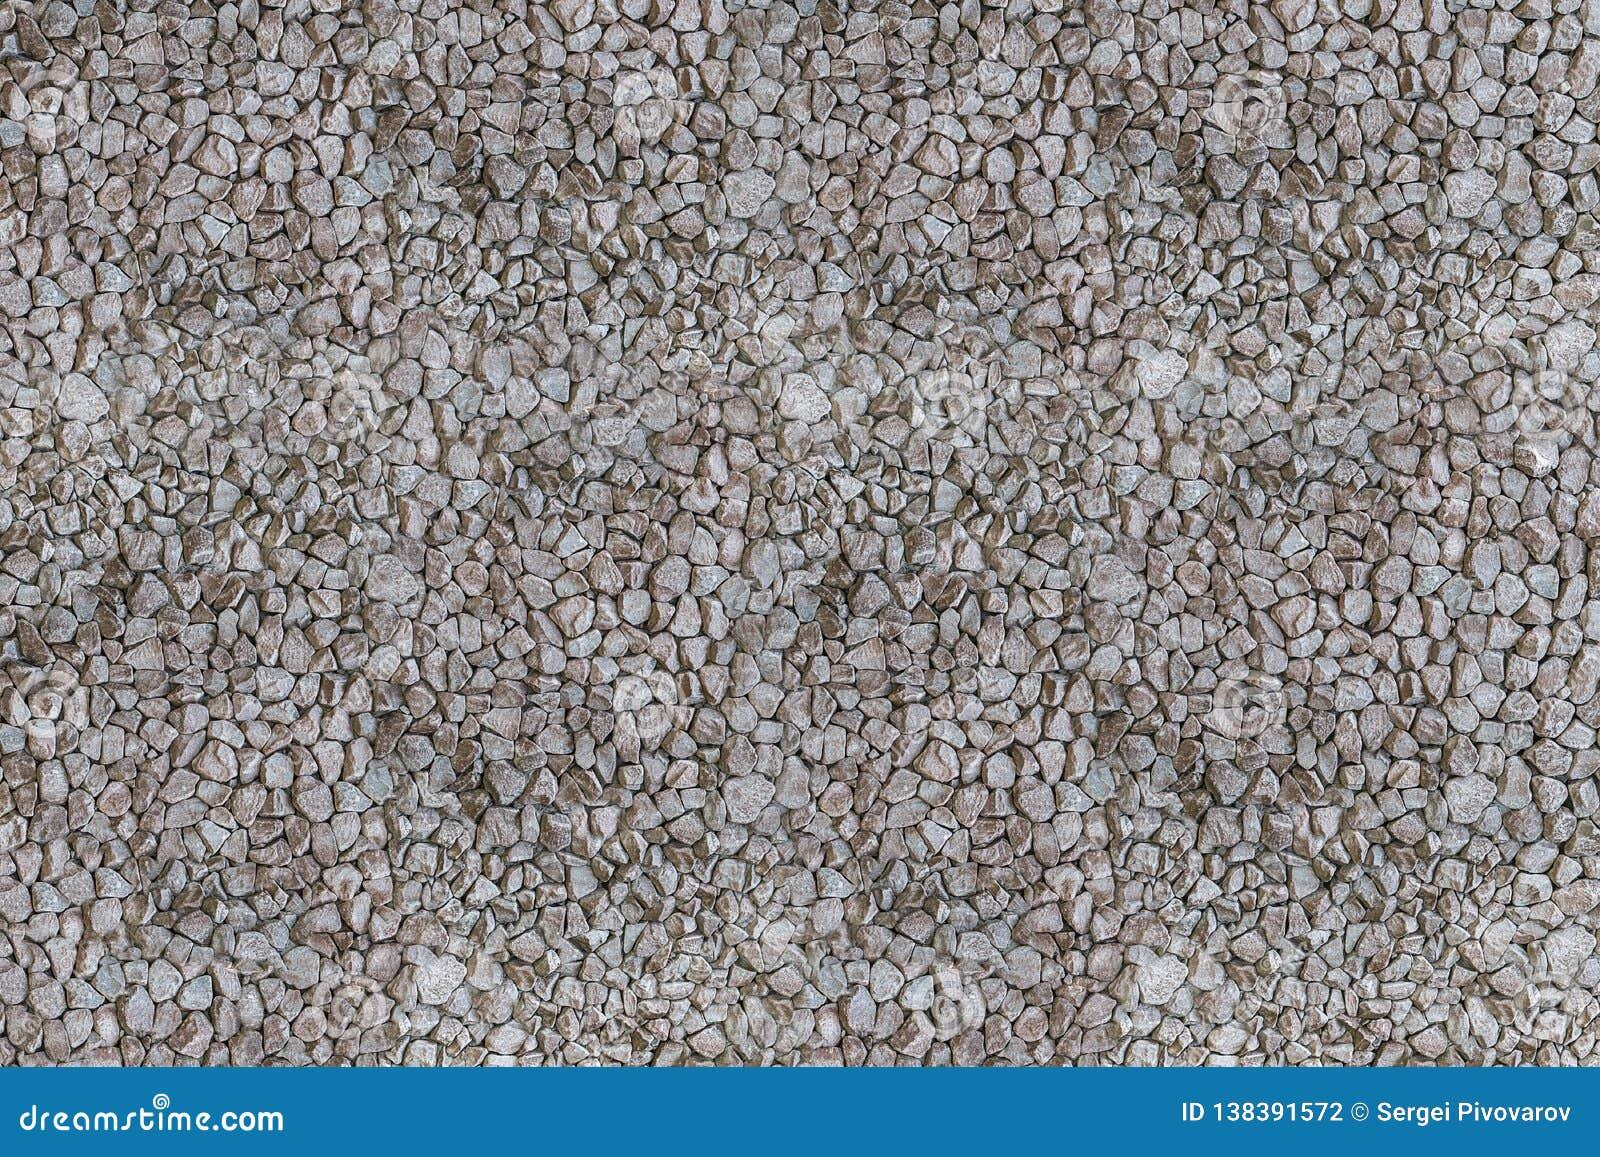 Stone canvas gray mini cobblestone texture hard base web design endless gravel background